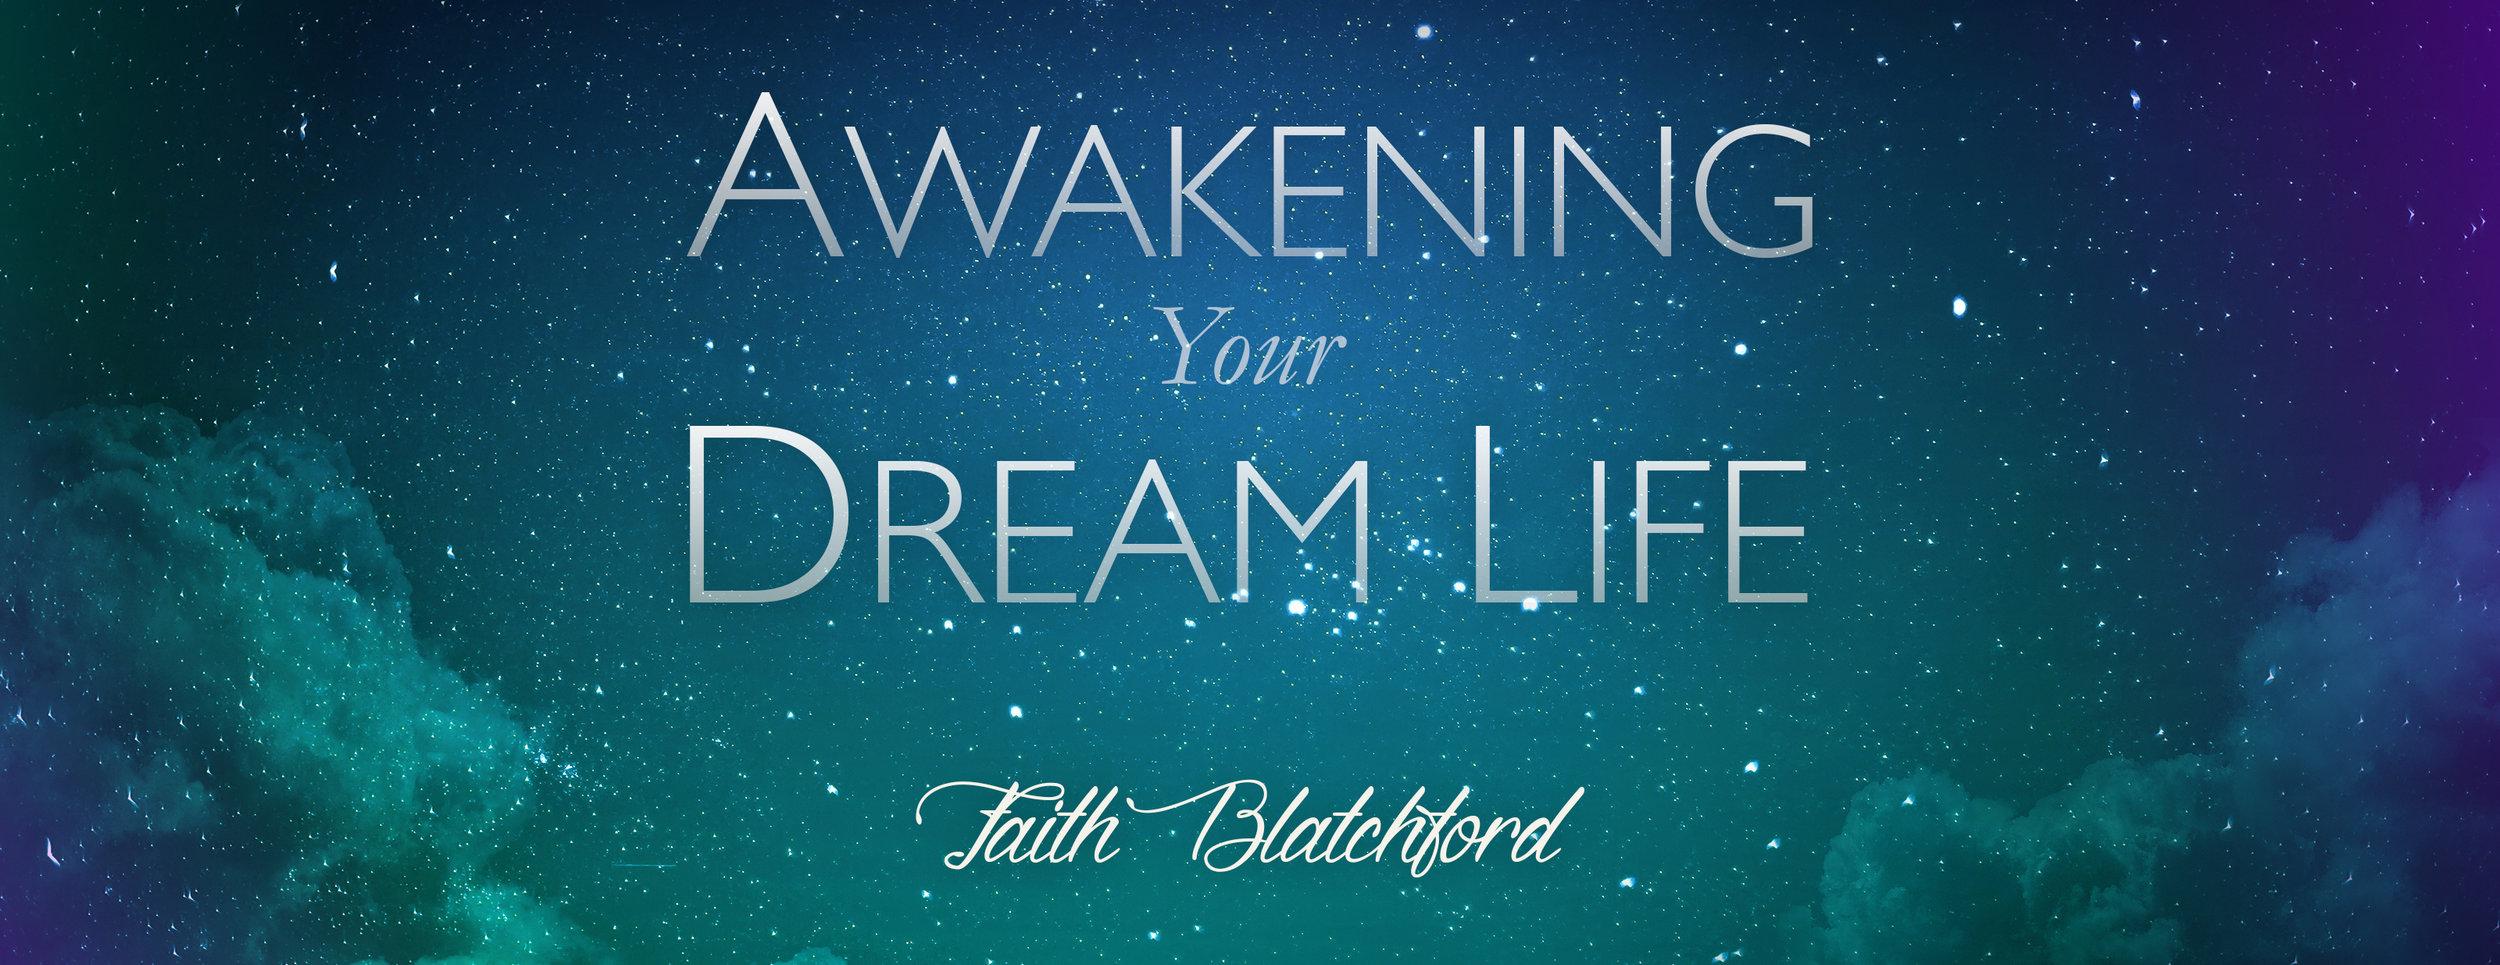 Awakening your dream life with Faith Blatchford